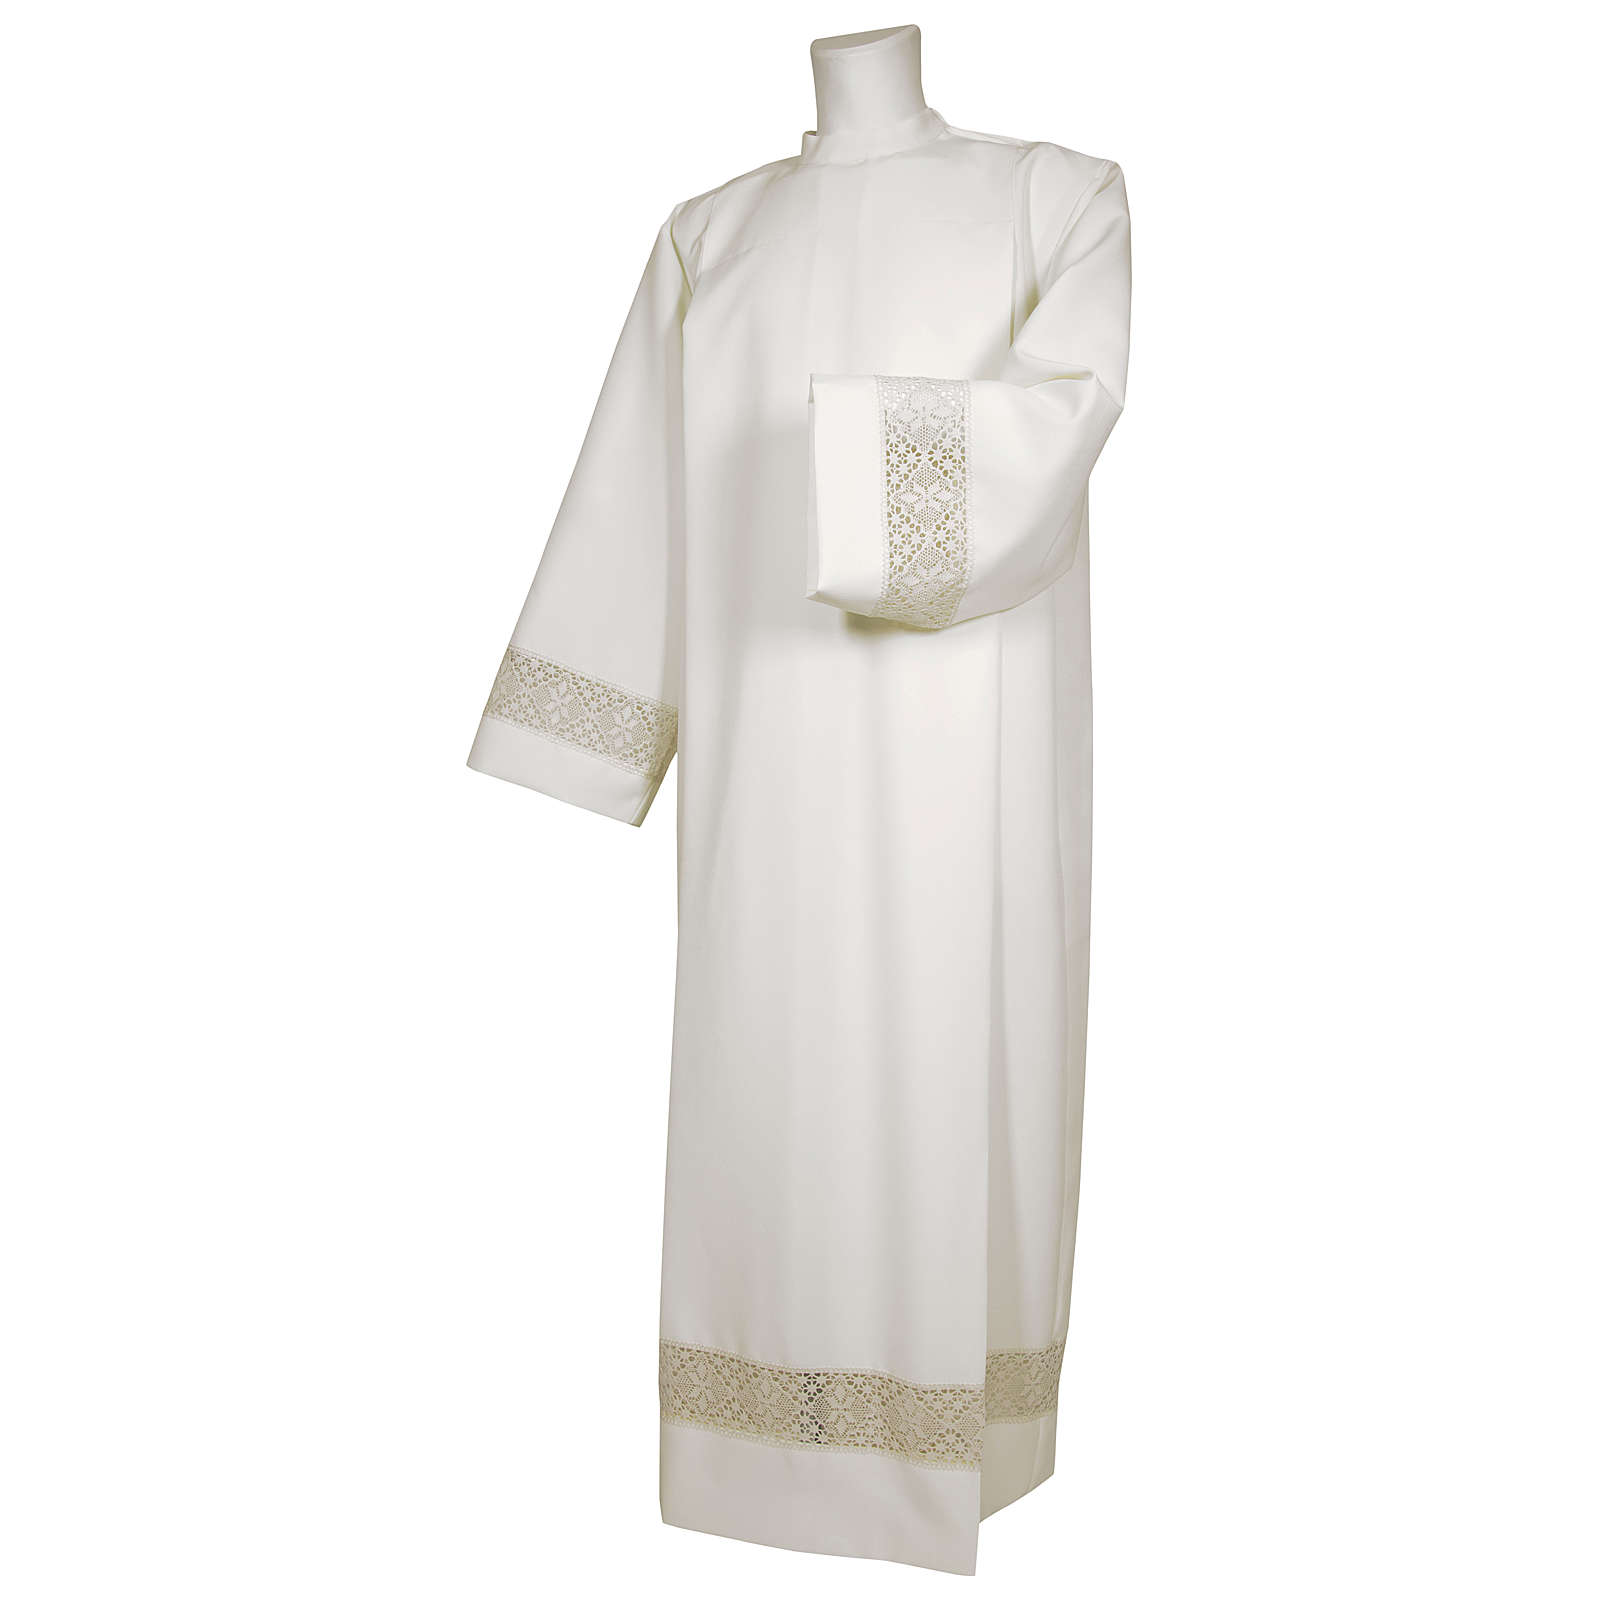 Alba blanca 65% poliéster 35% algodón motivos en la manga entredós encaje cremallera en la parte anterior 4